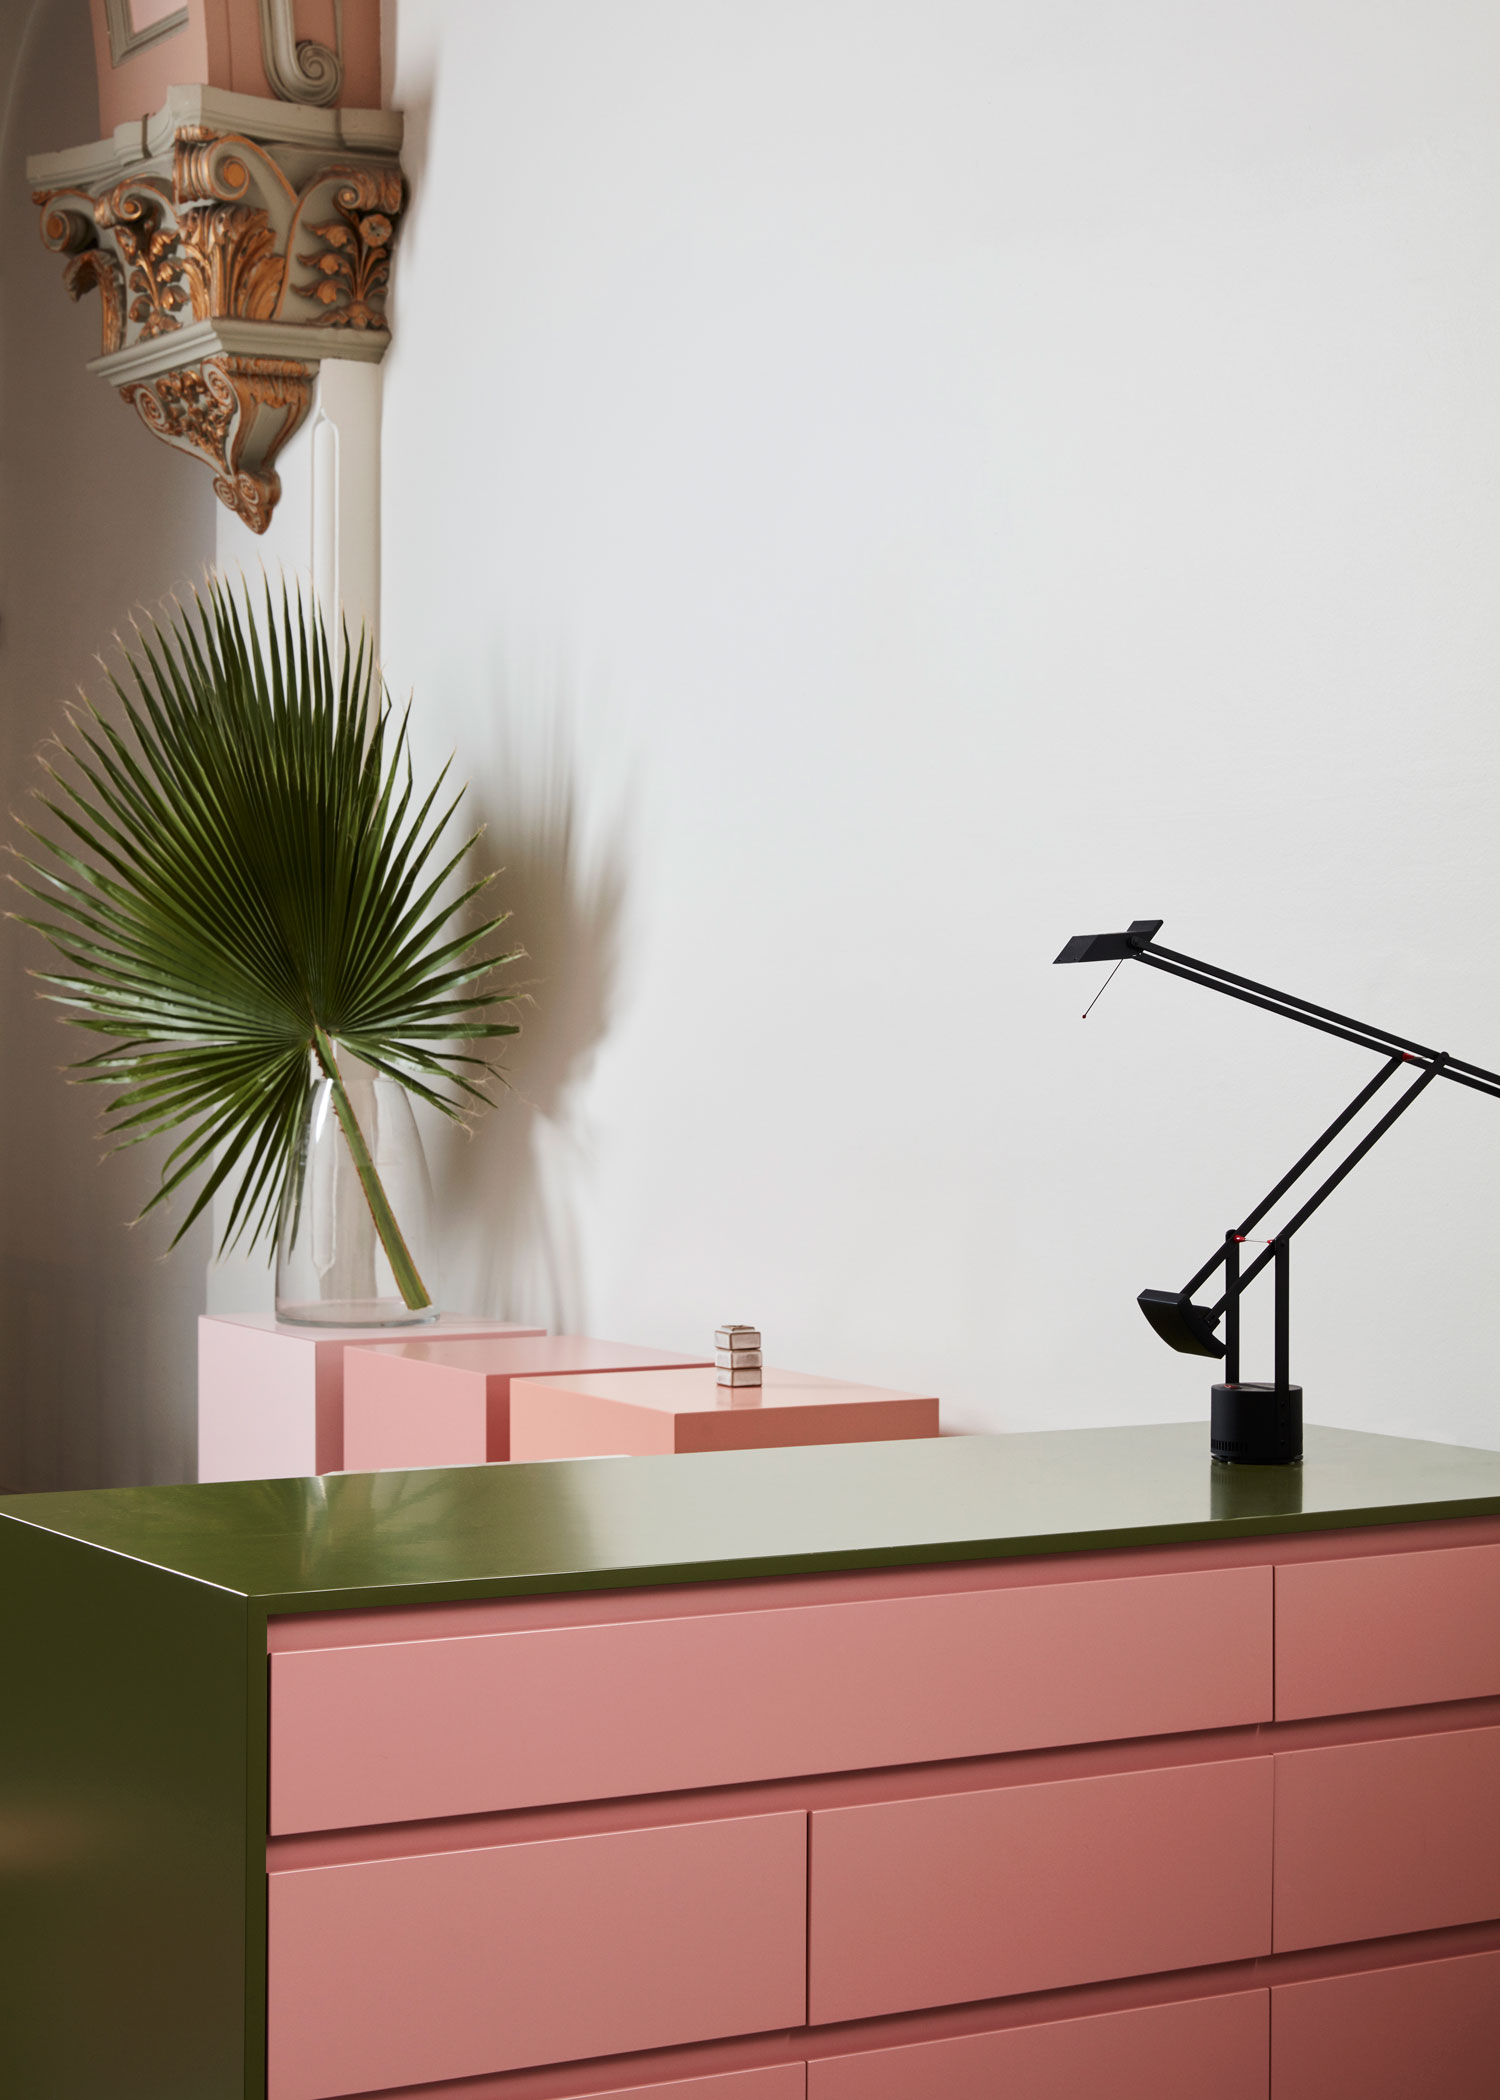 Monk House Design S New Store In Melbourne Trendland